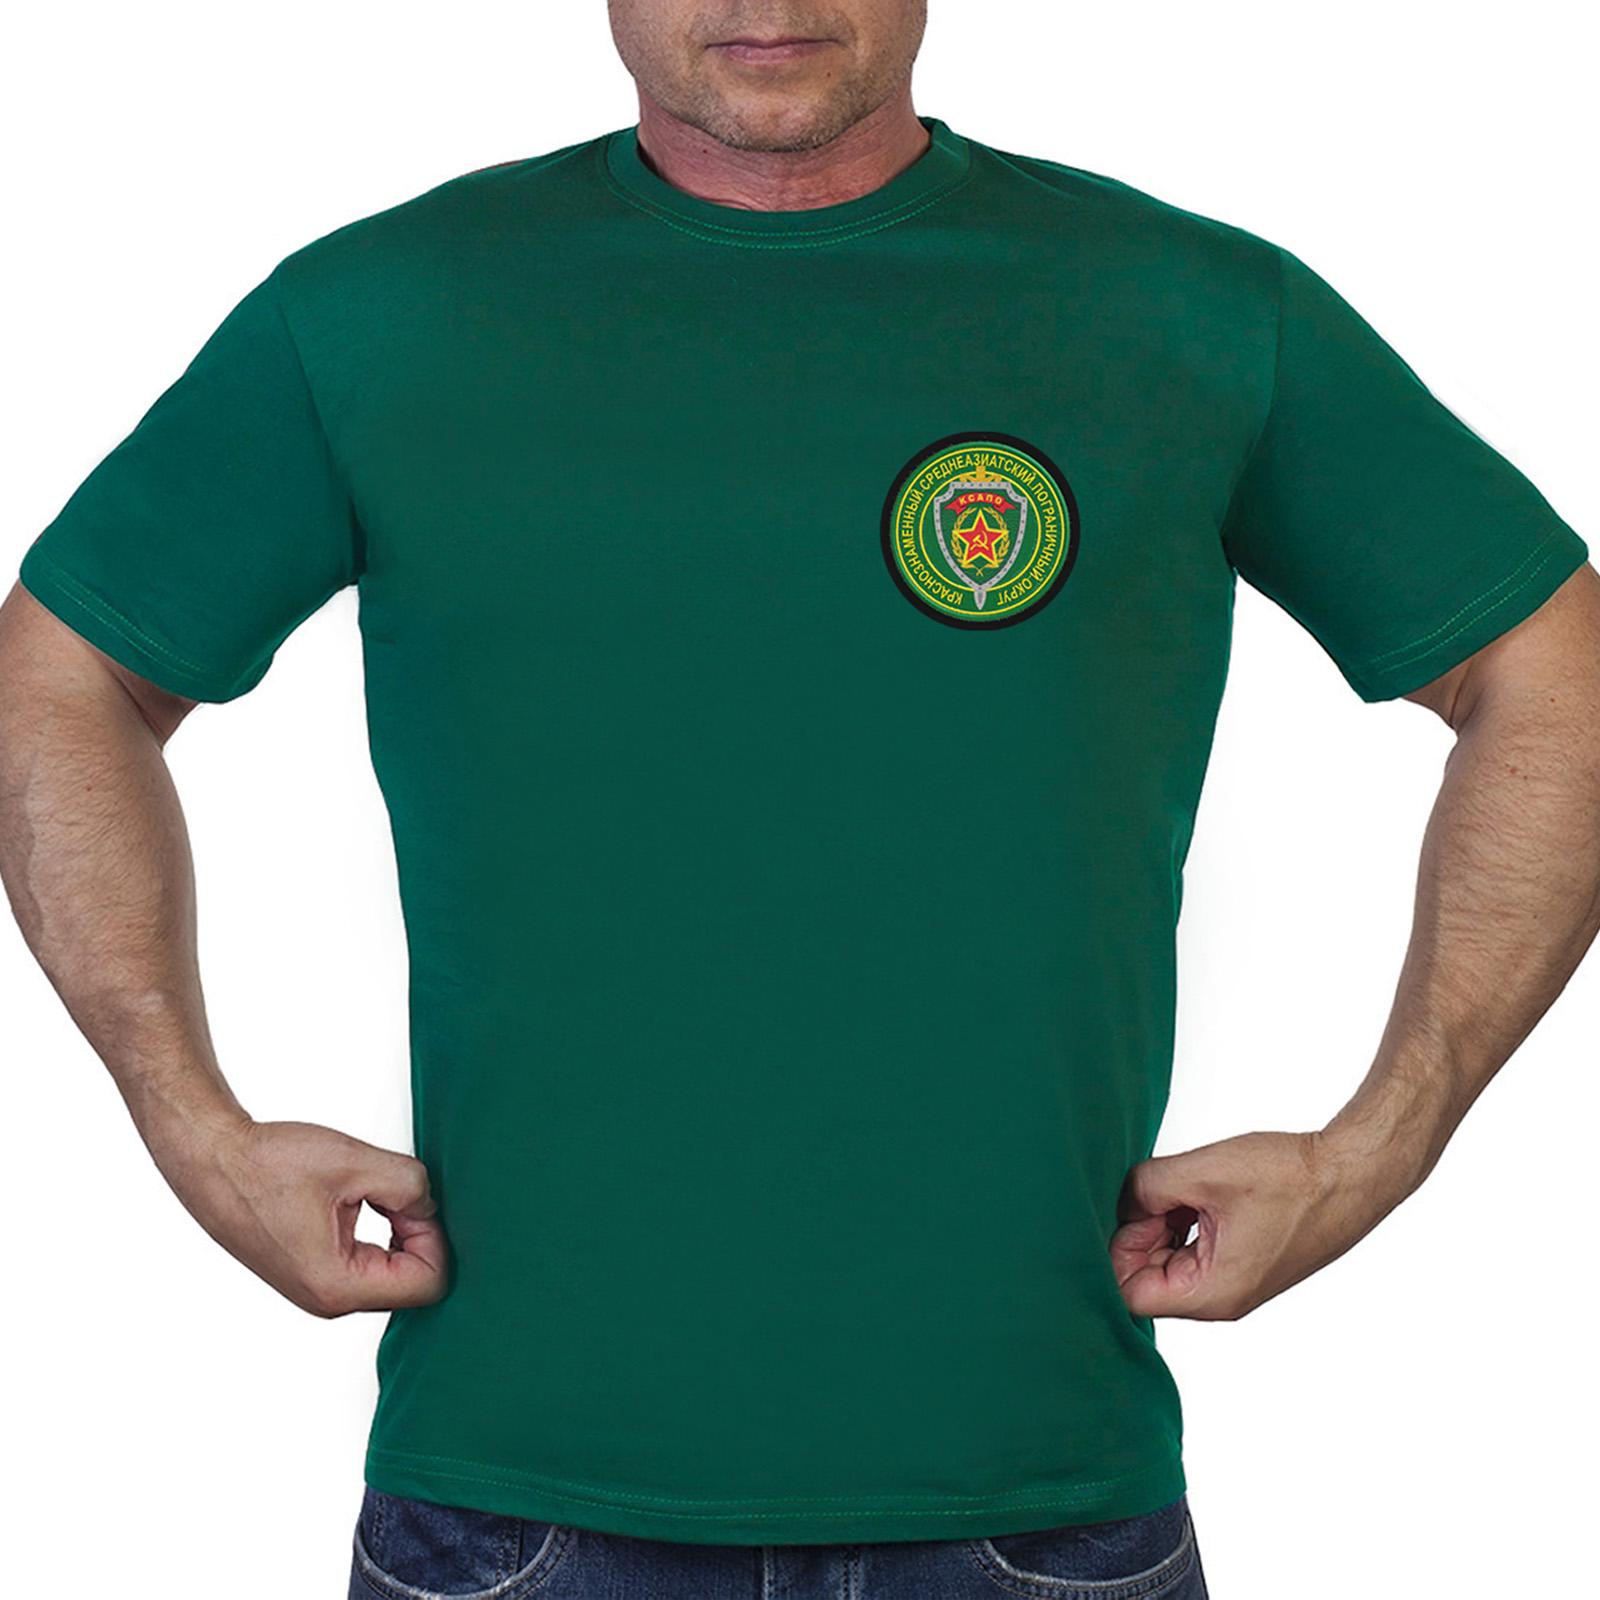 Зелёная футболка с шевроном КСАПО